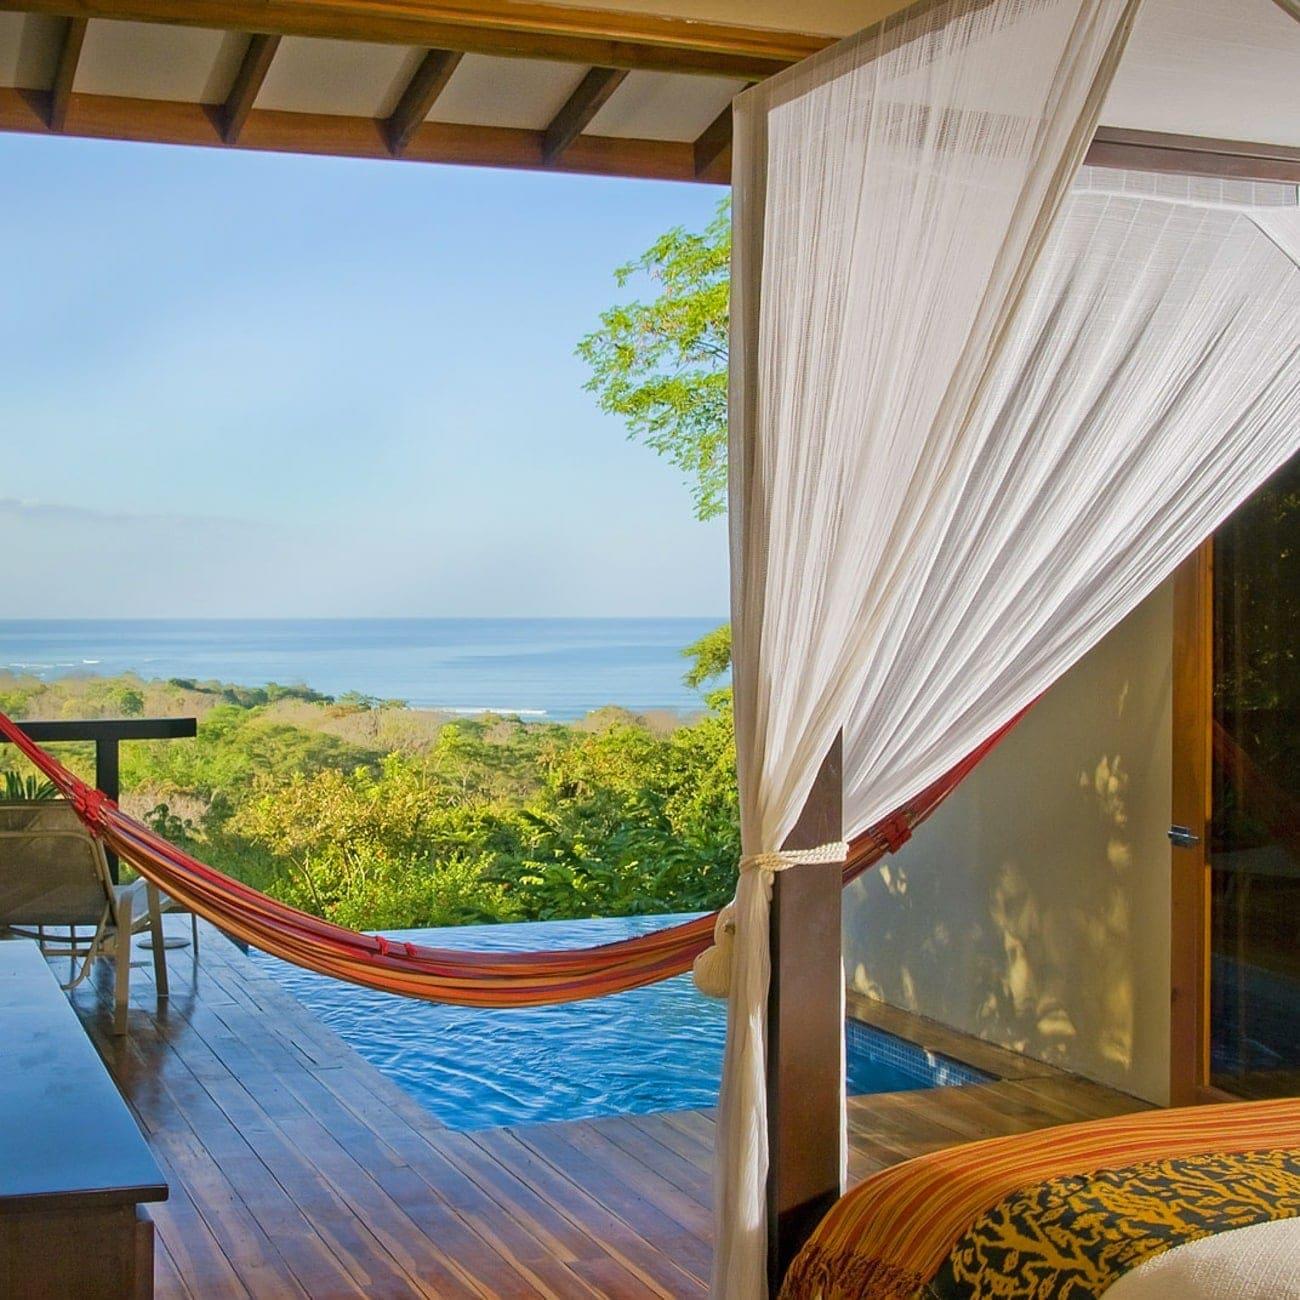 Fabulous ocean view from Casa Chameleon Mal Pais' honeymoon suite.